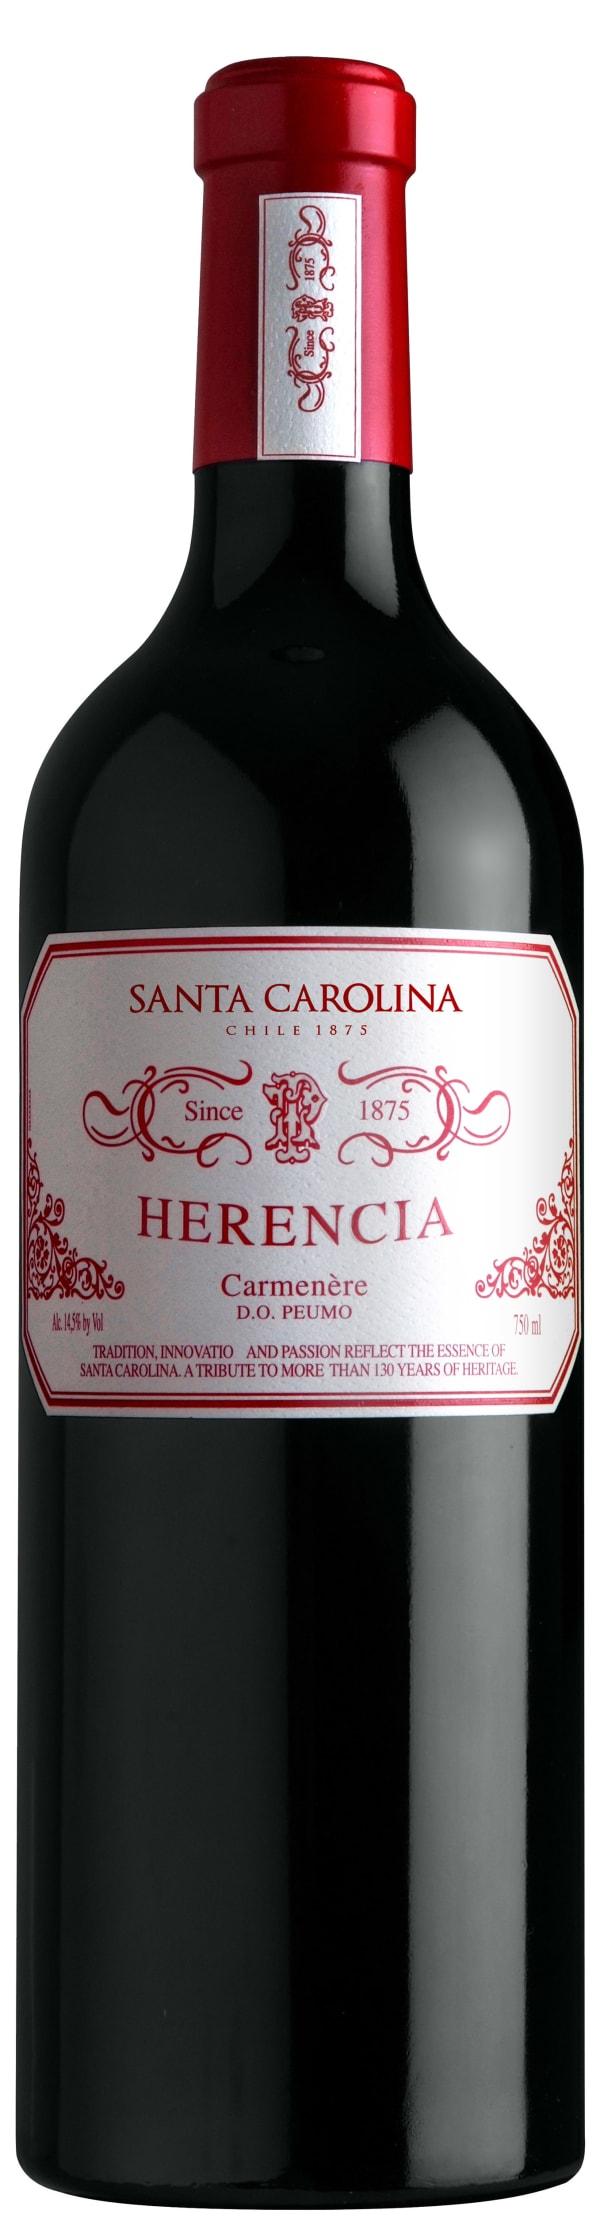 Santa Carolina Herencia 2009